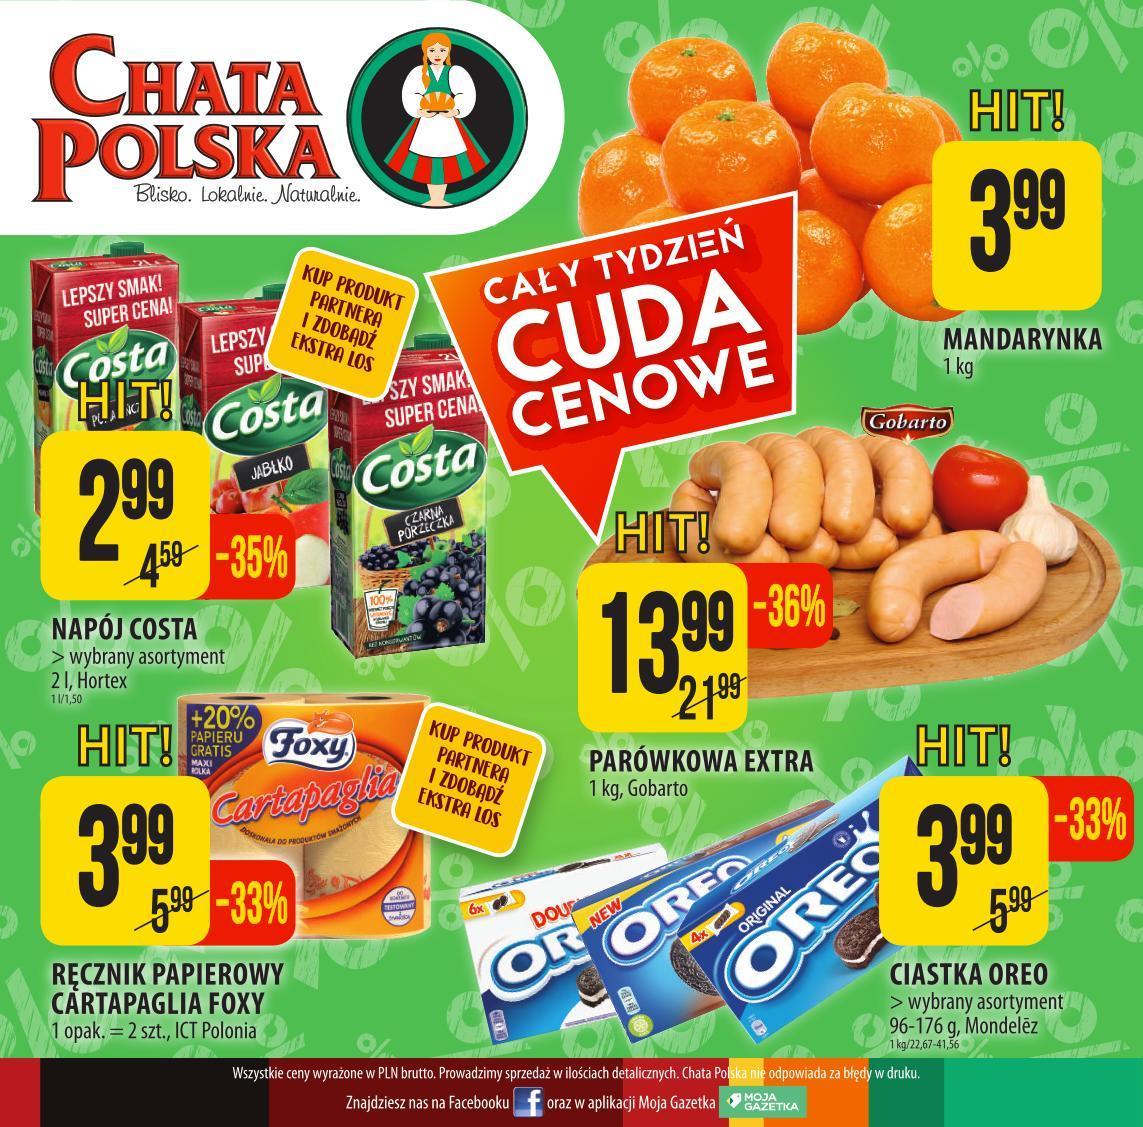 Gazetka promocyjna Chata Polska do 21/11/2018 str.7